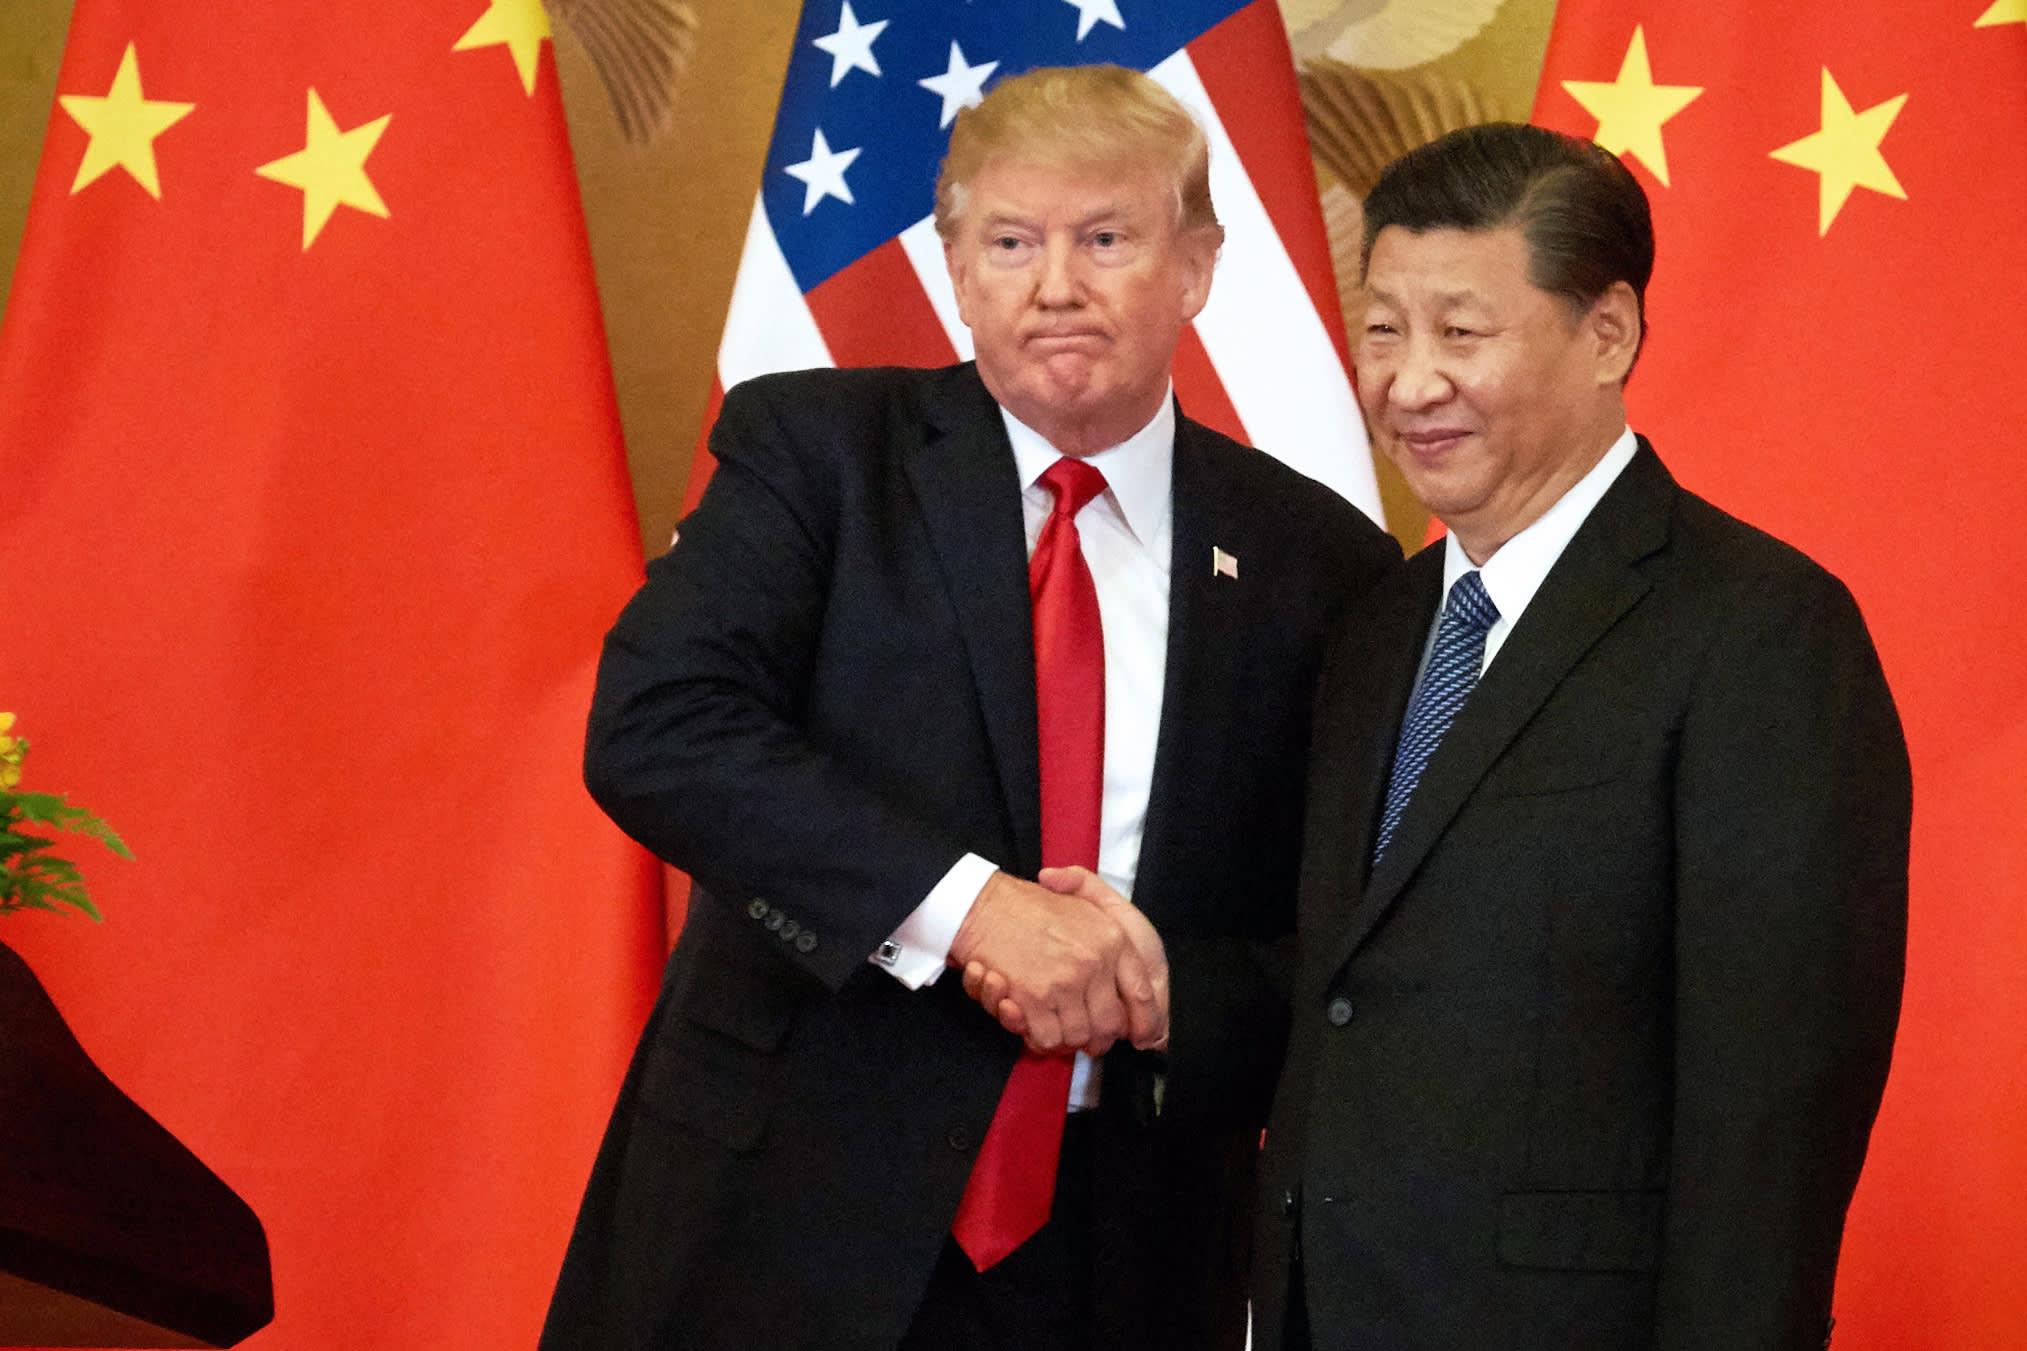 Jim Cramer warns renewed U.S.-China trade tensions worry investors